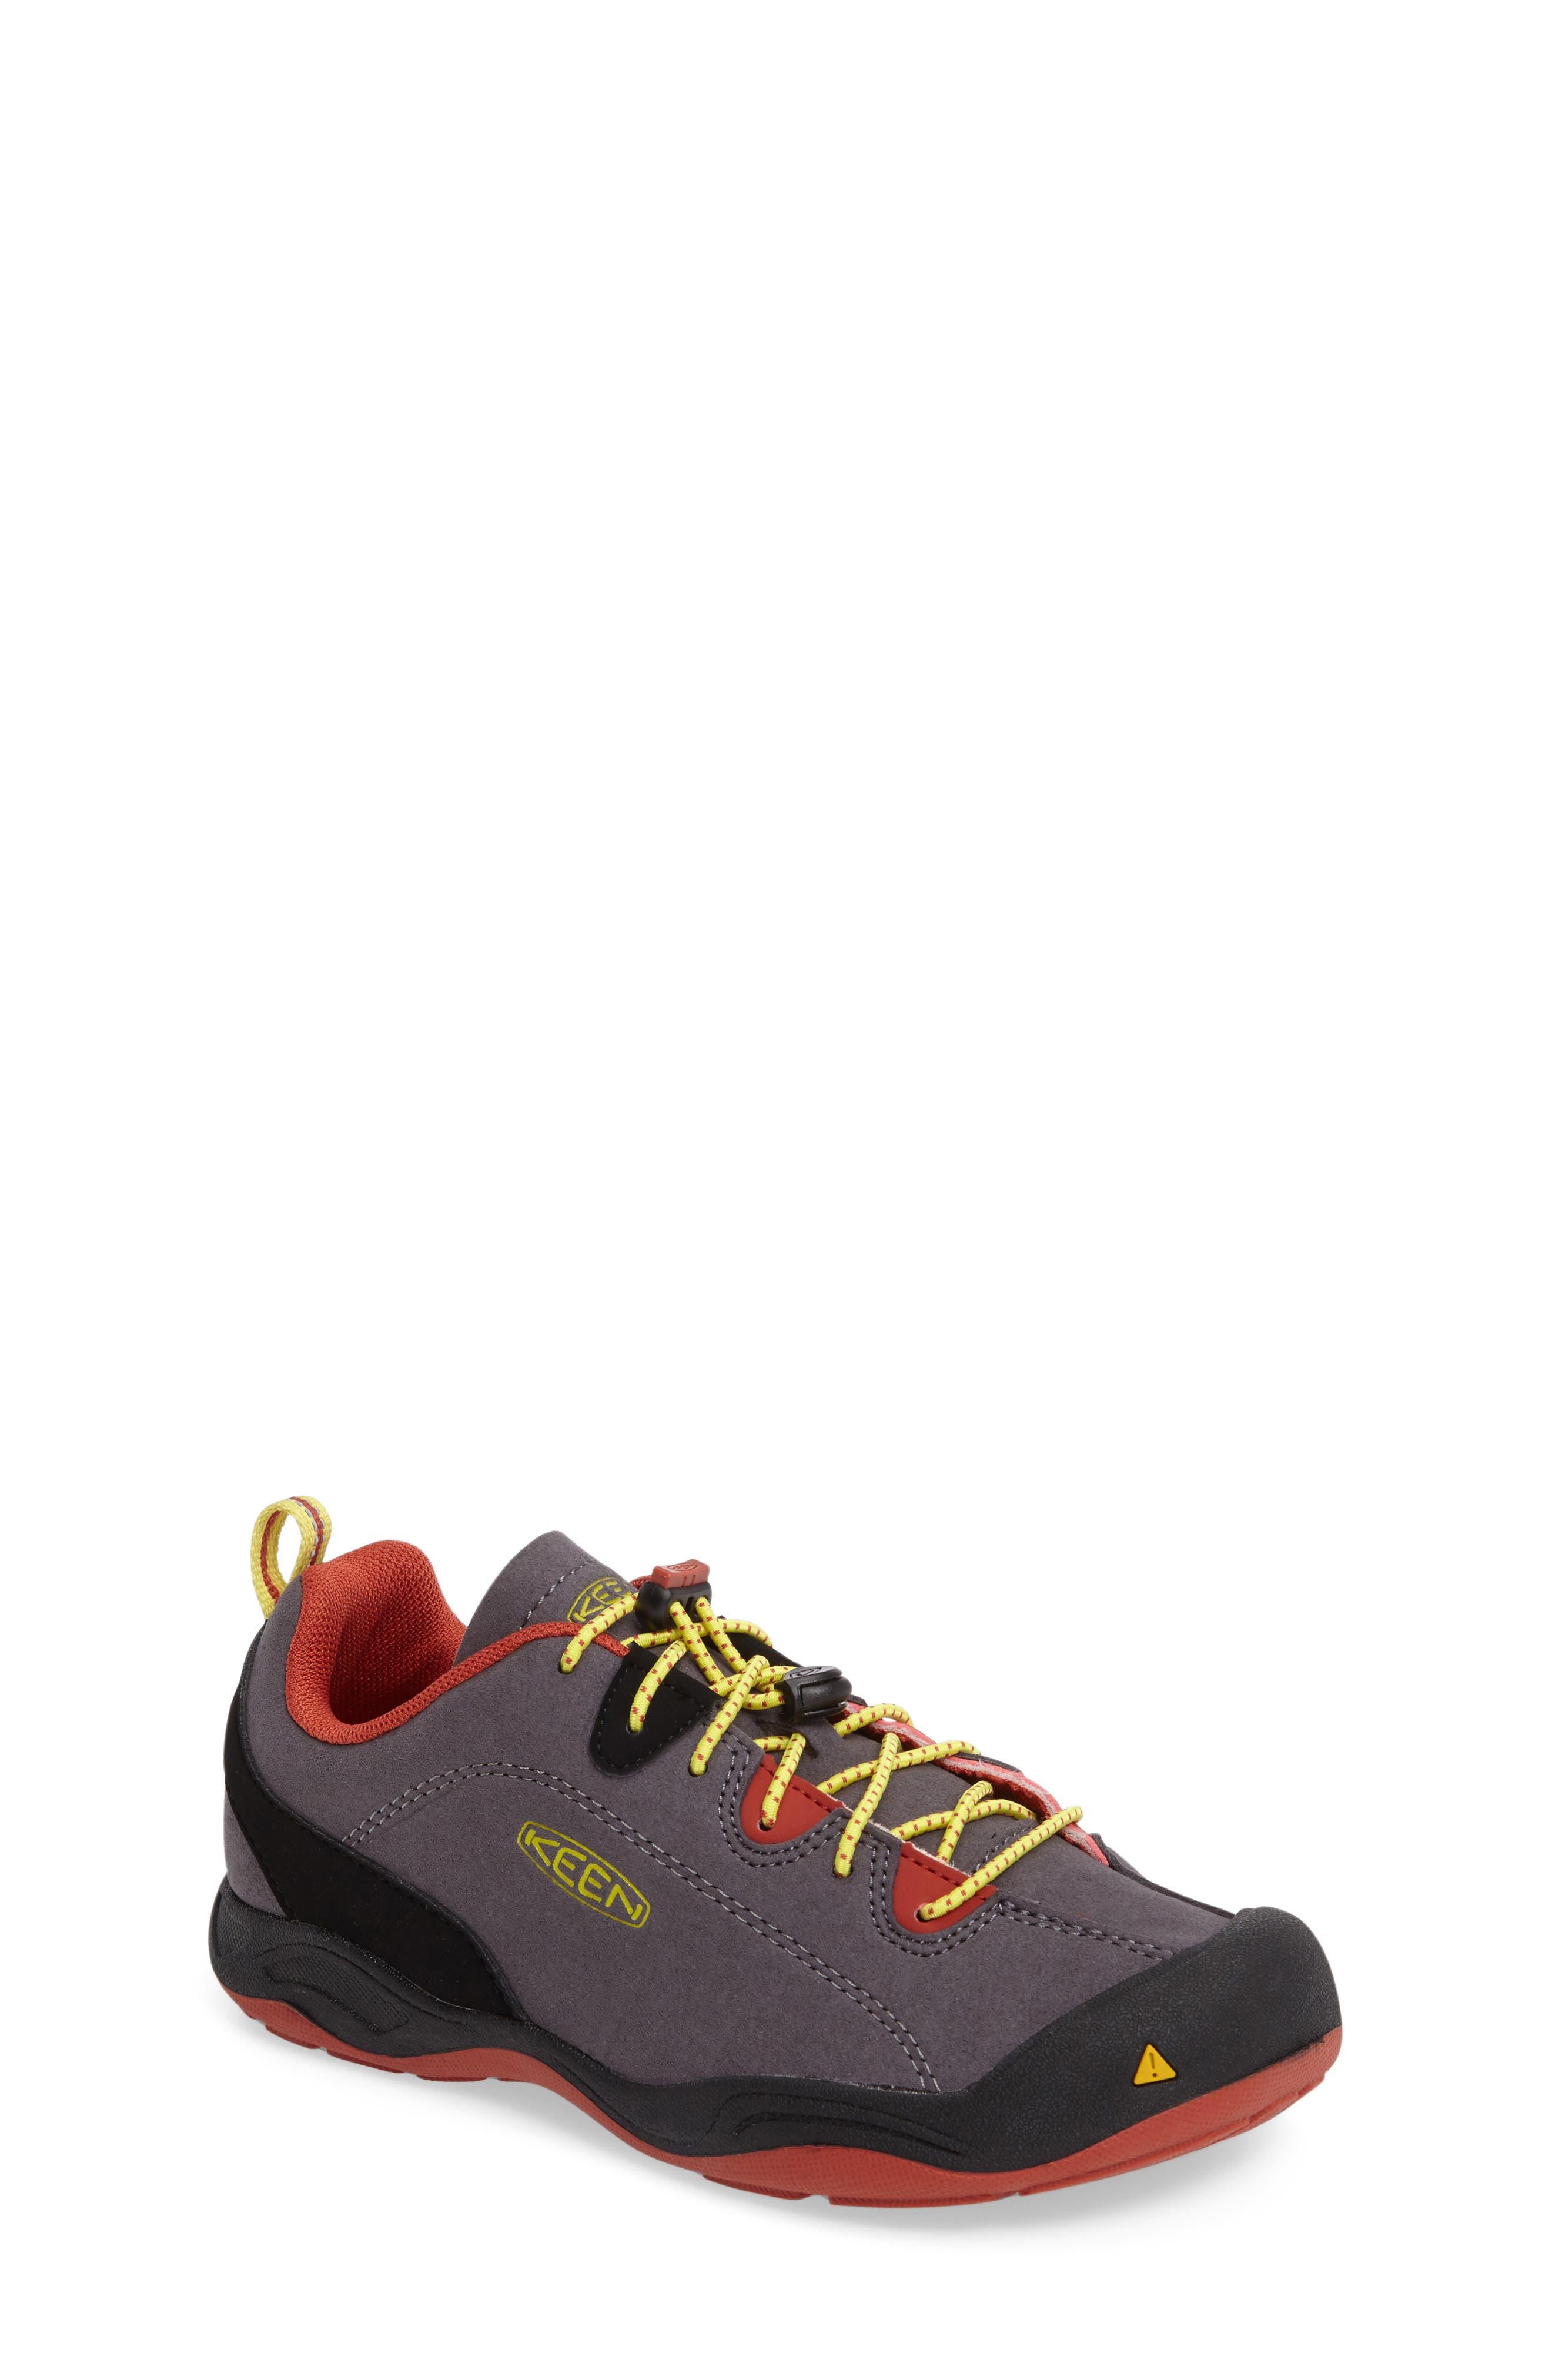 Jasper Sneaker,                         Main,                         color, Magnet